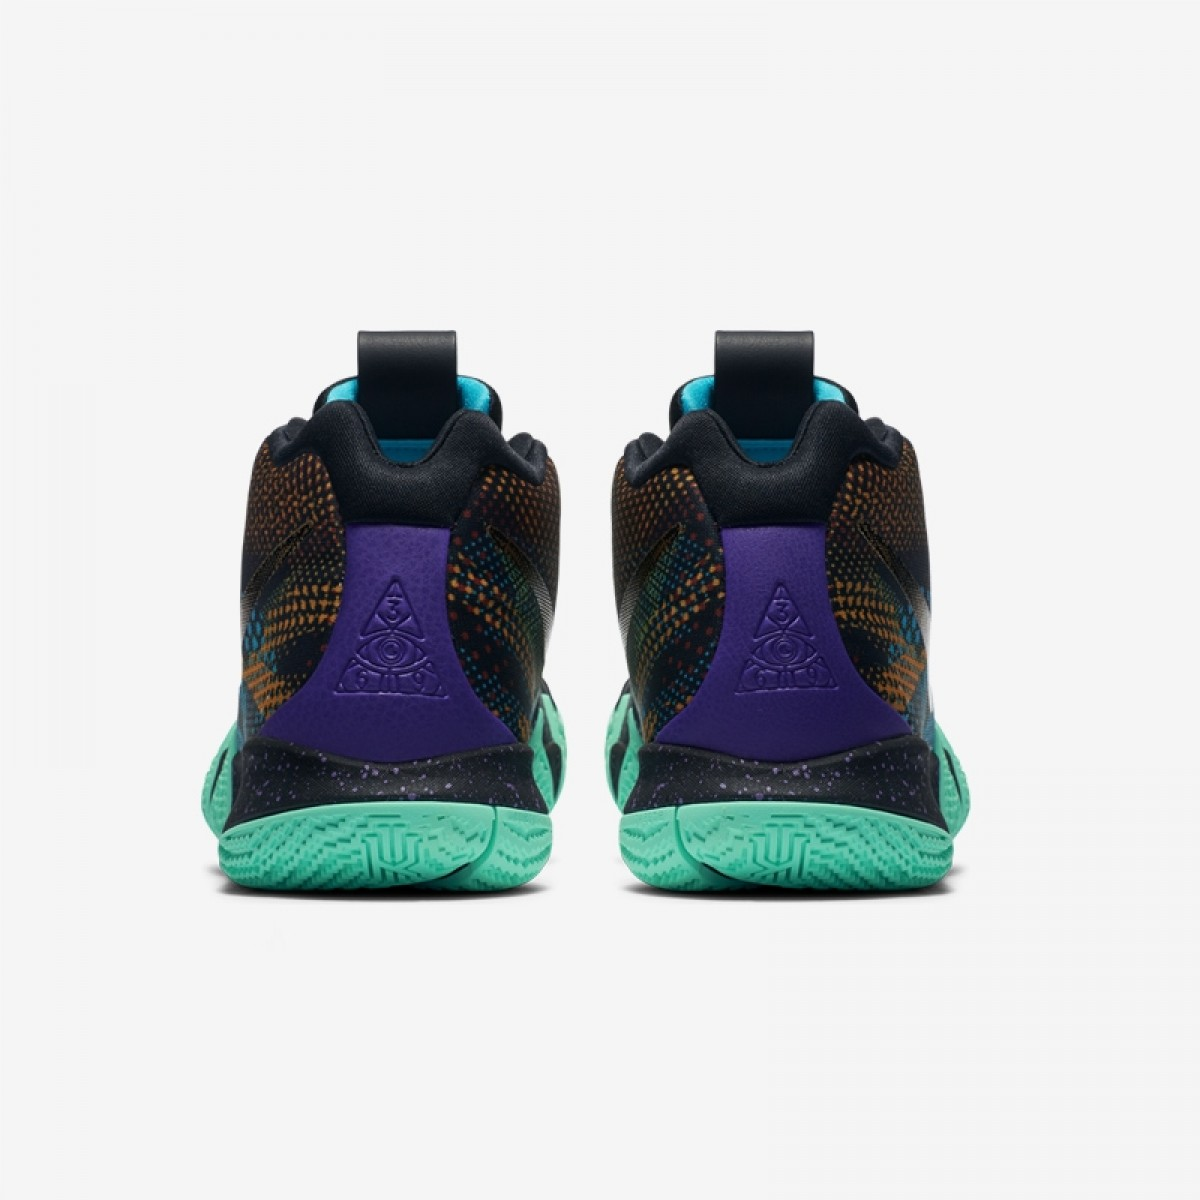 Nike Kyrie 4 'Mamba' AV2597-001